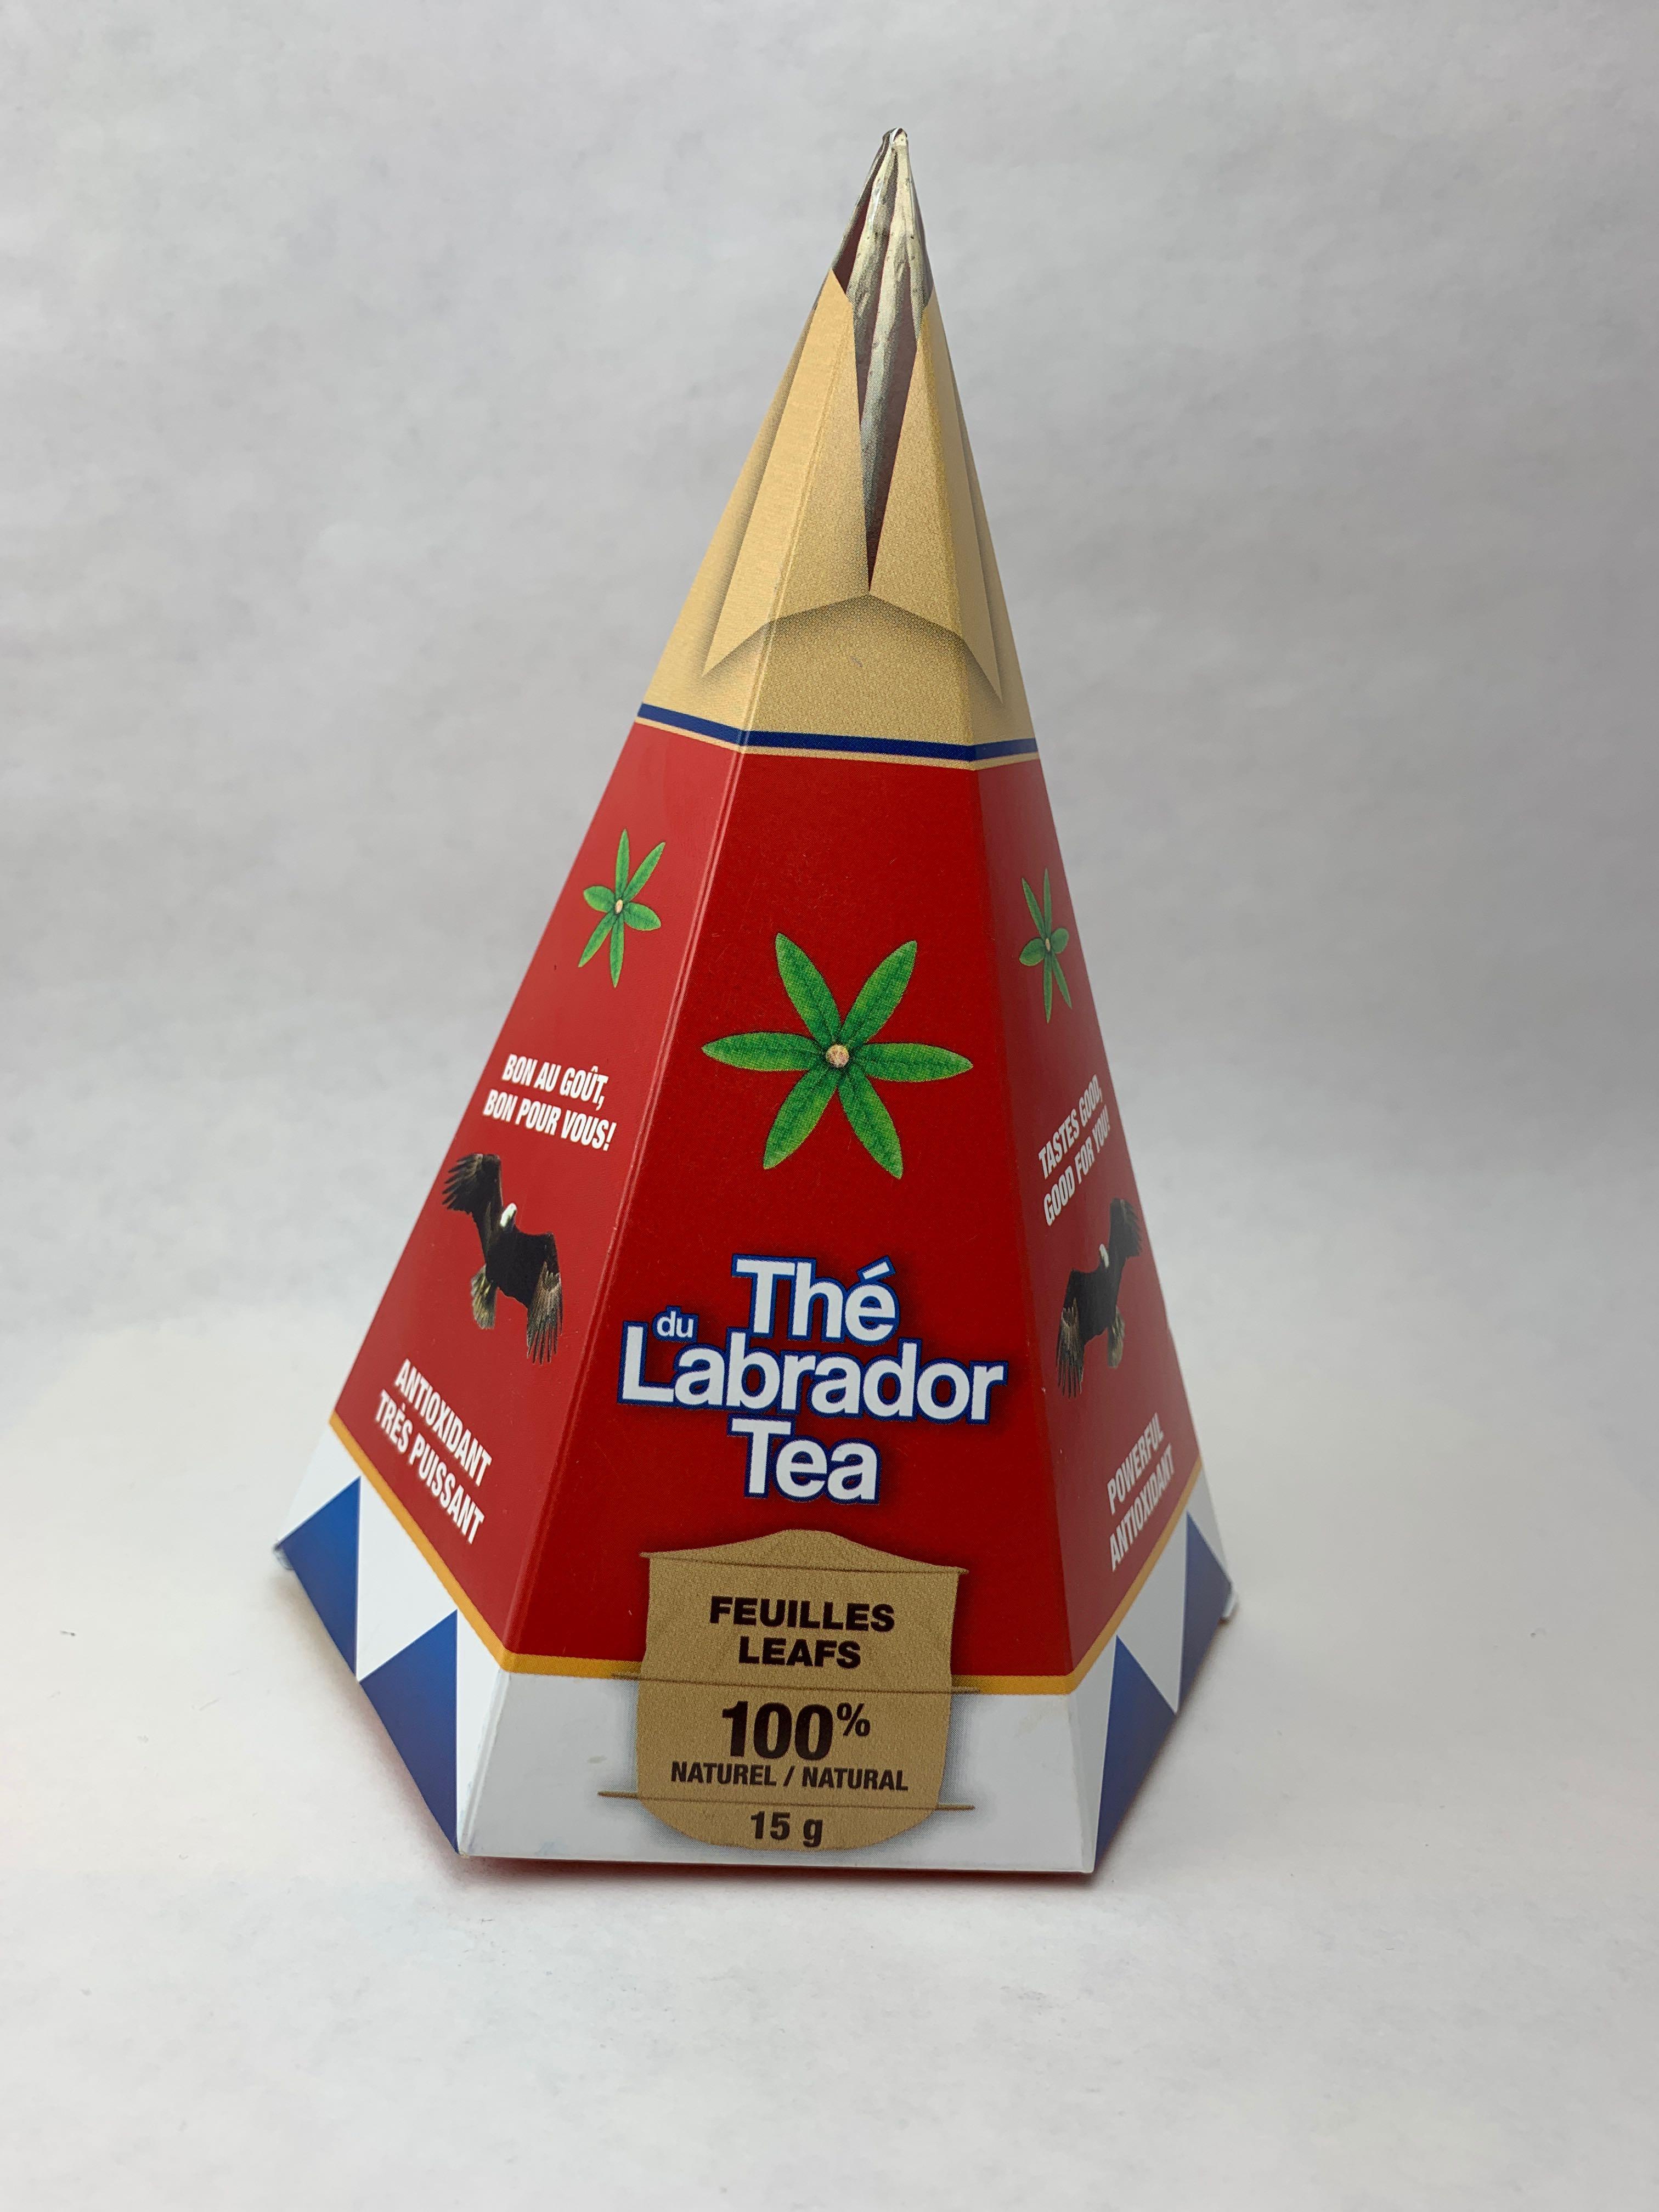 tipi thé du Labrador ledon